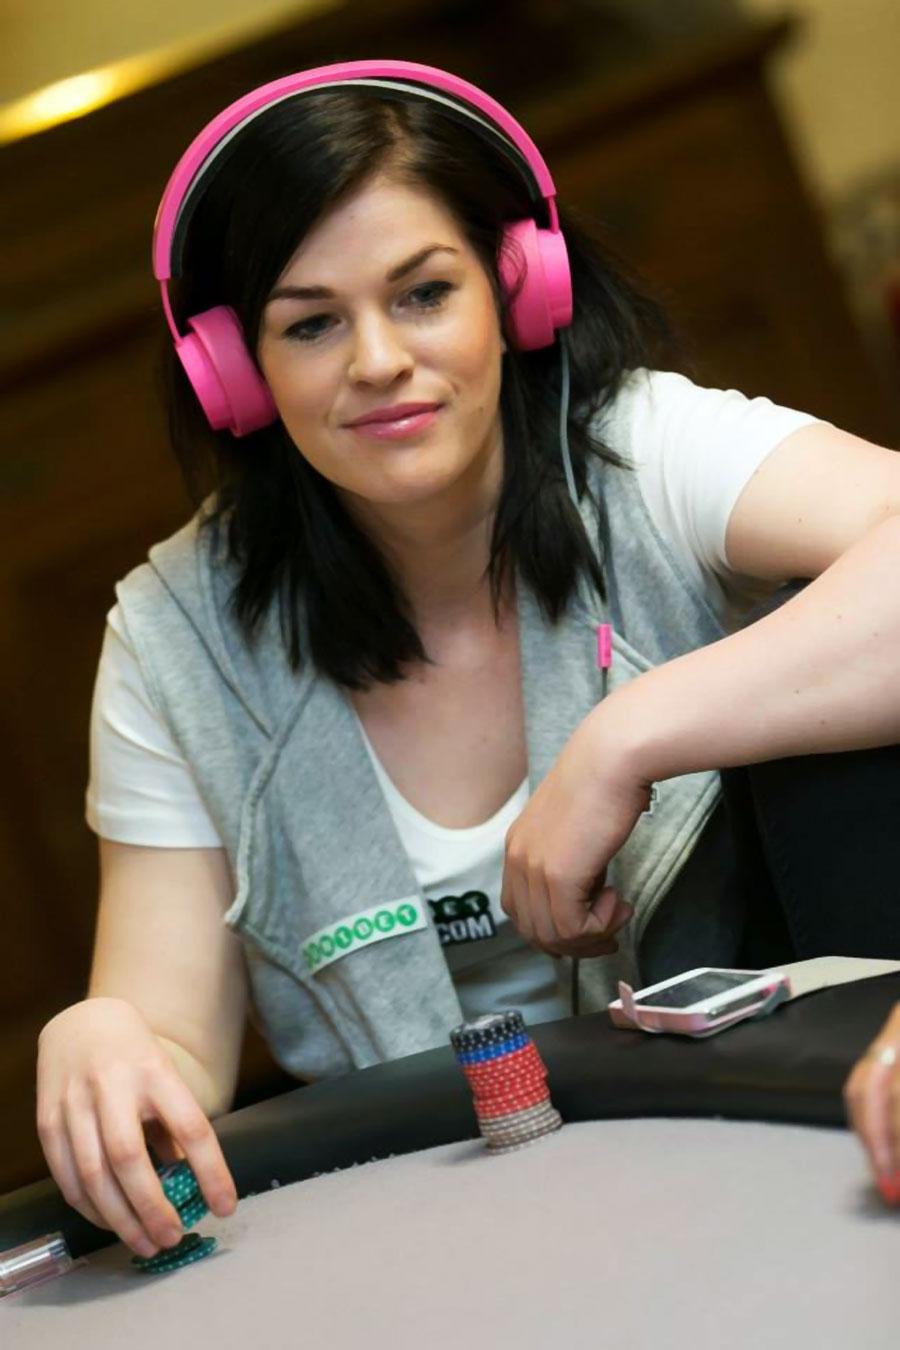 pokerdreea